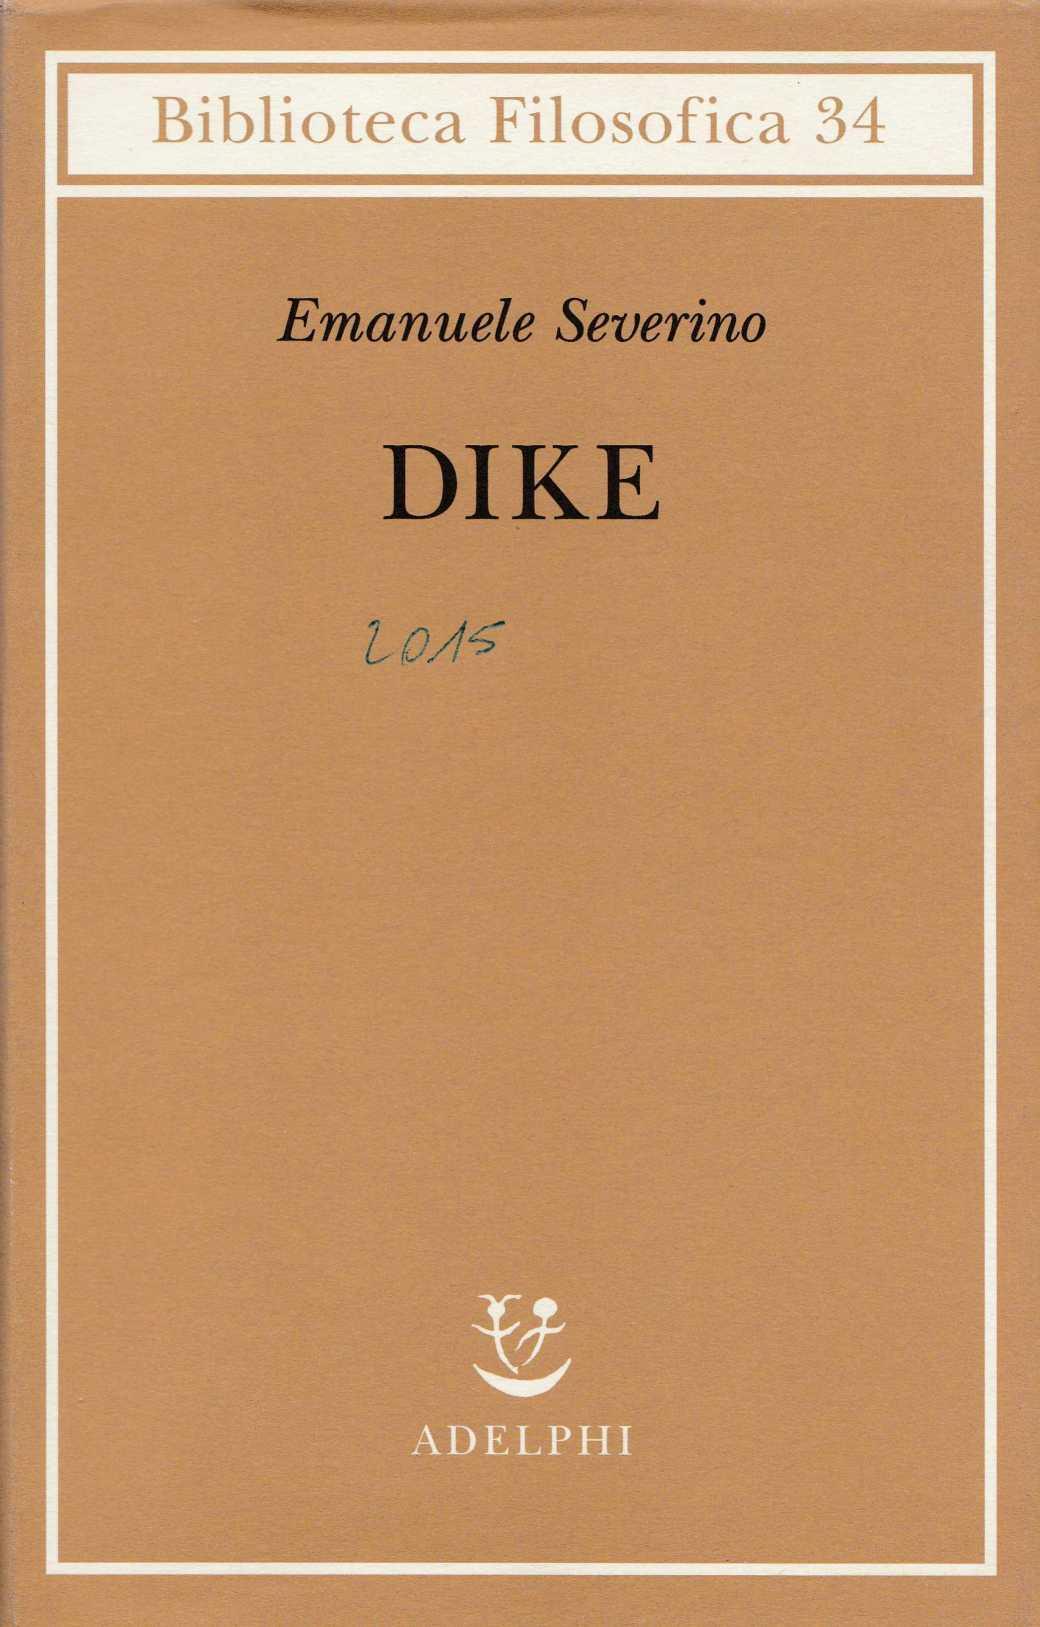 dike4268